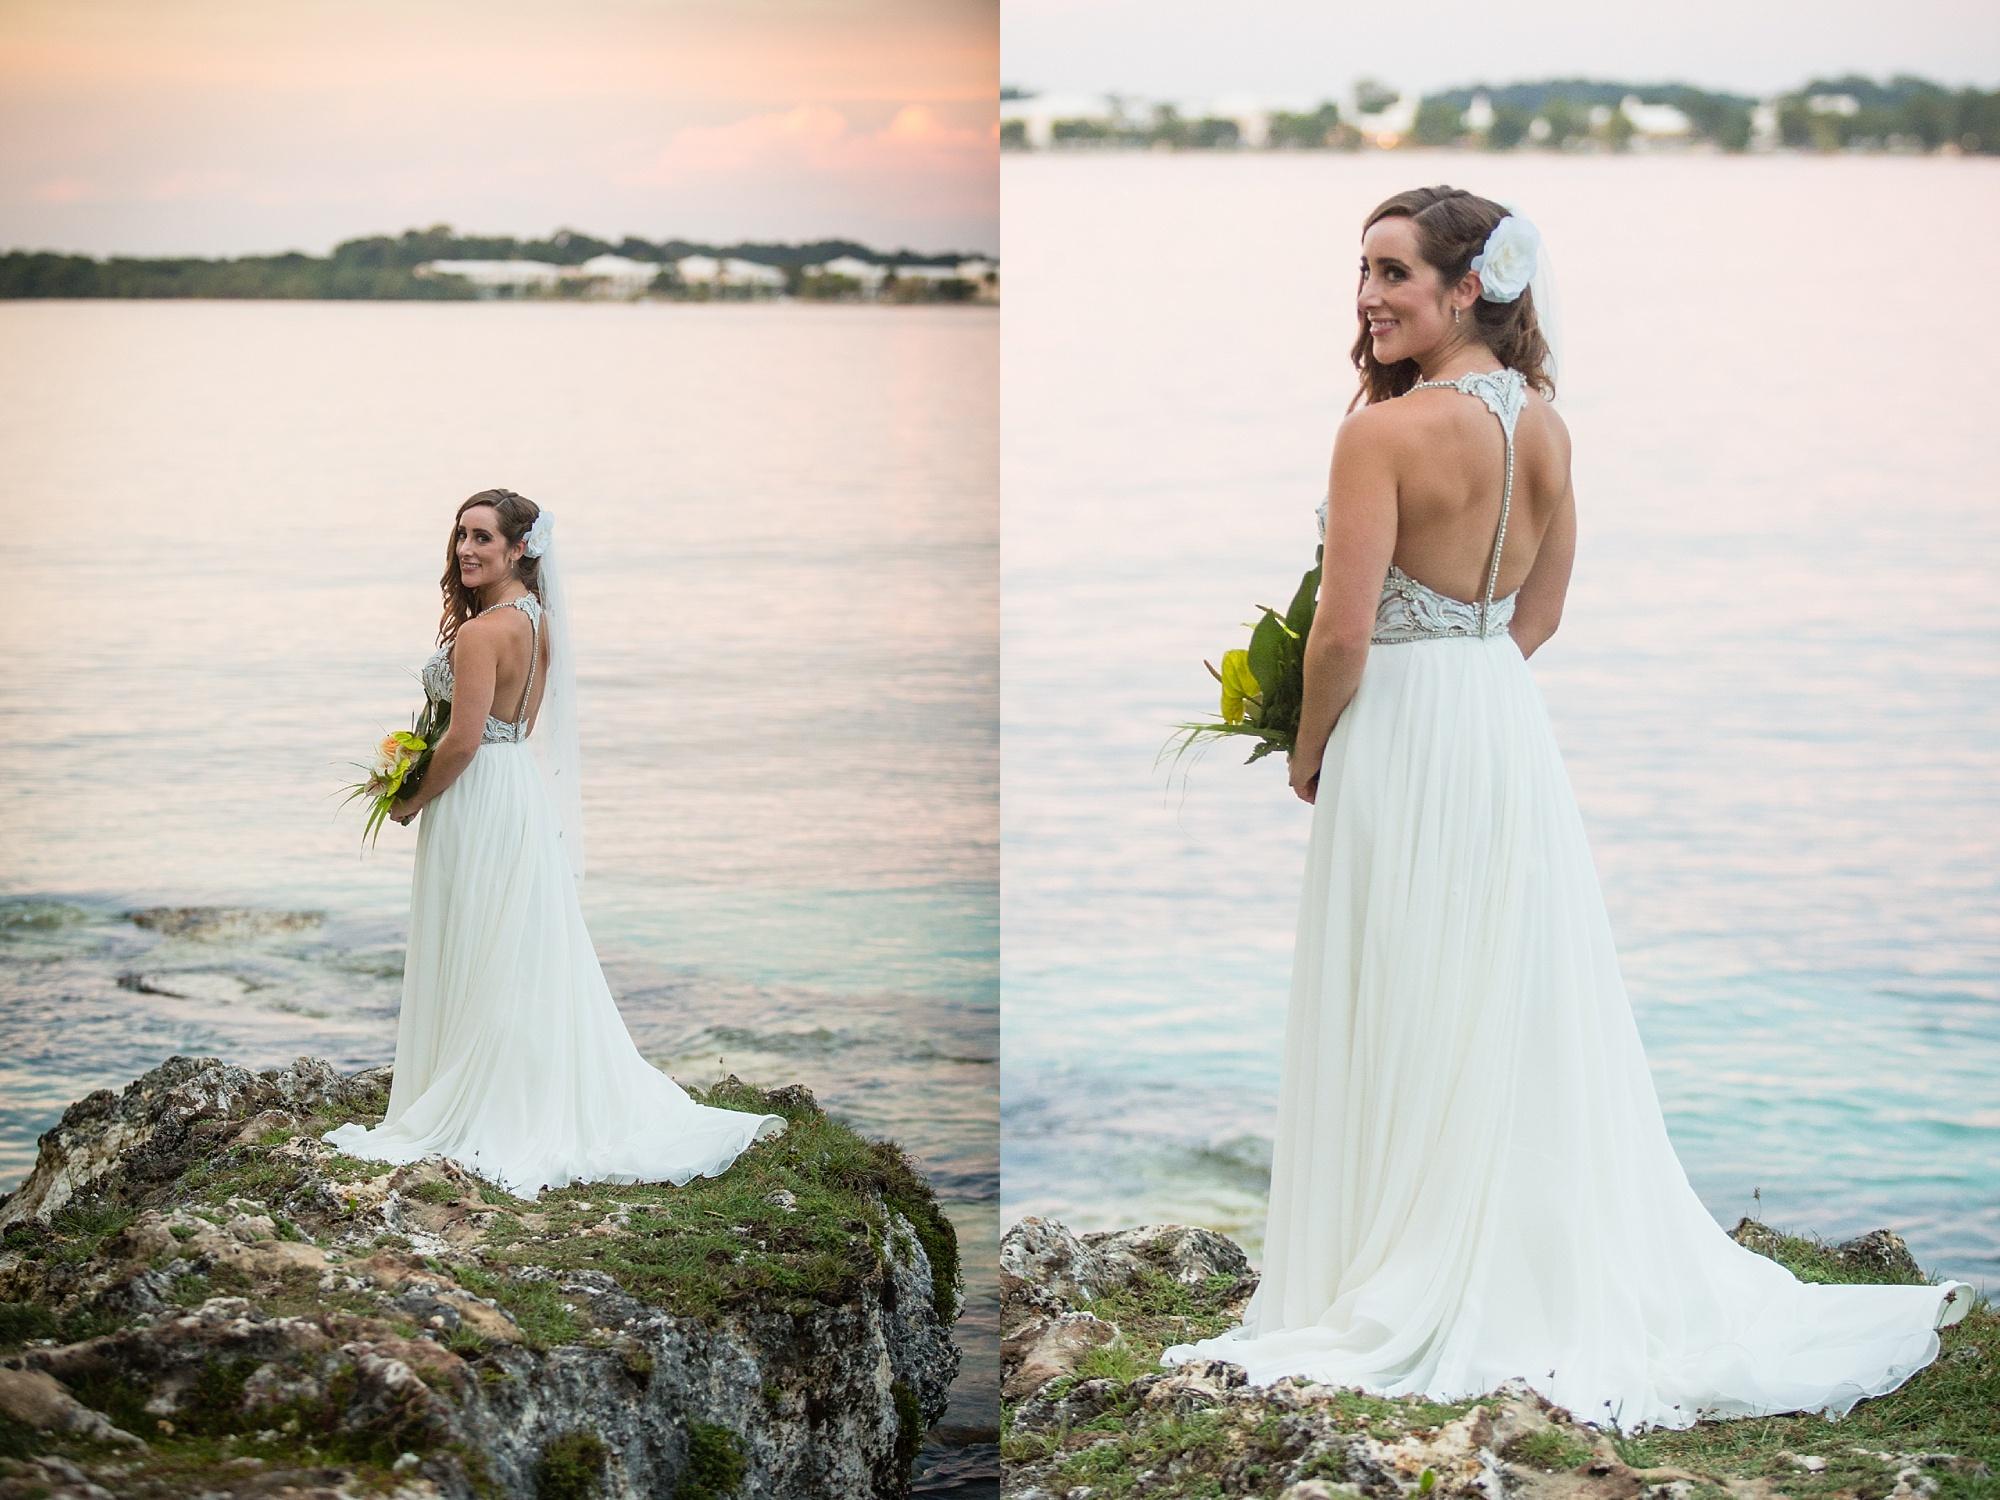 Brandon_Shafer_Photography_Scott_Marisa_Negril_Jamaica_Destination_Wedding_Photography_0048.jpg